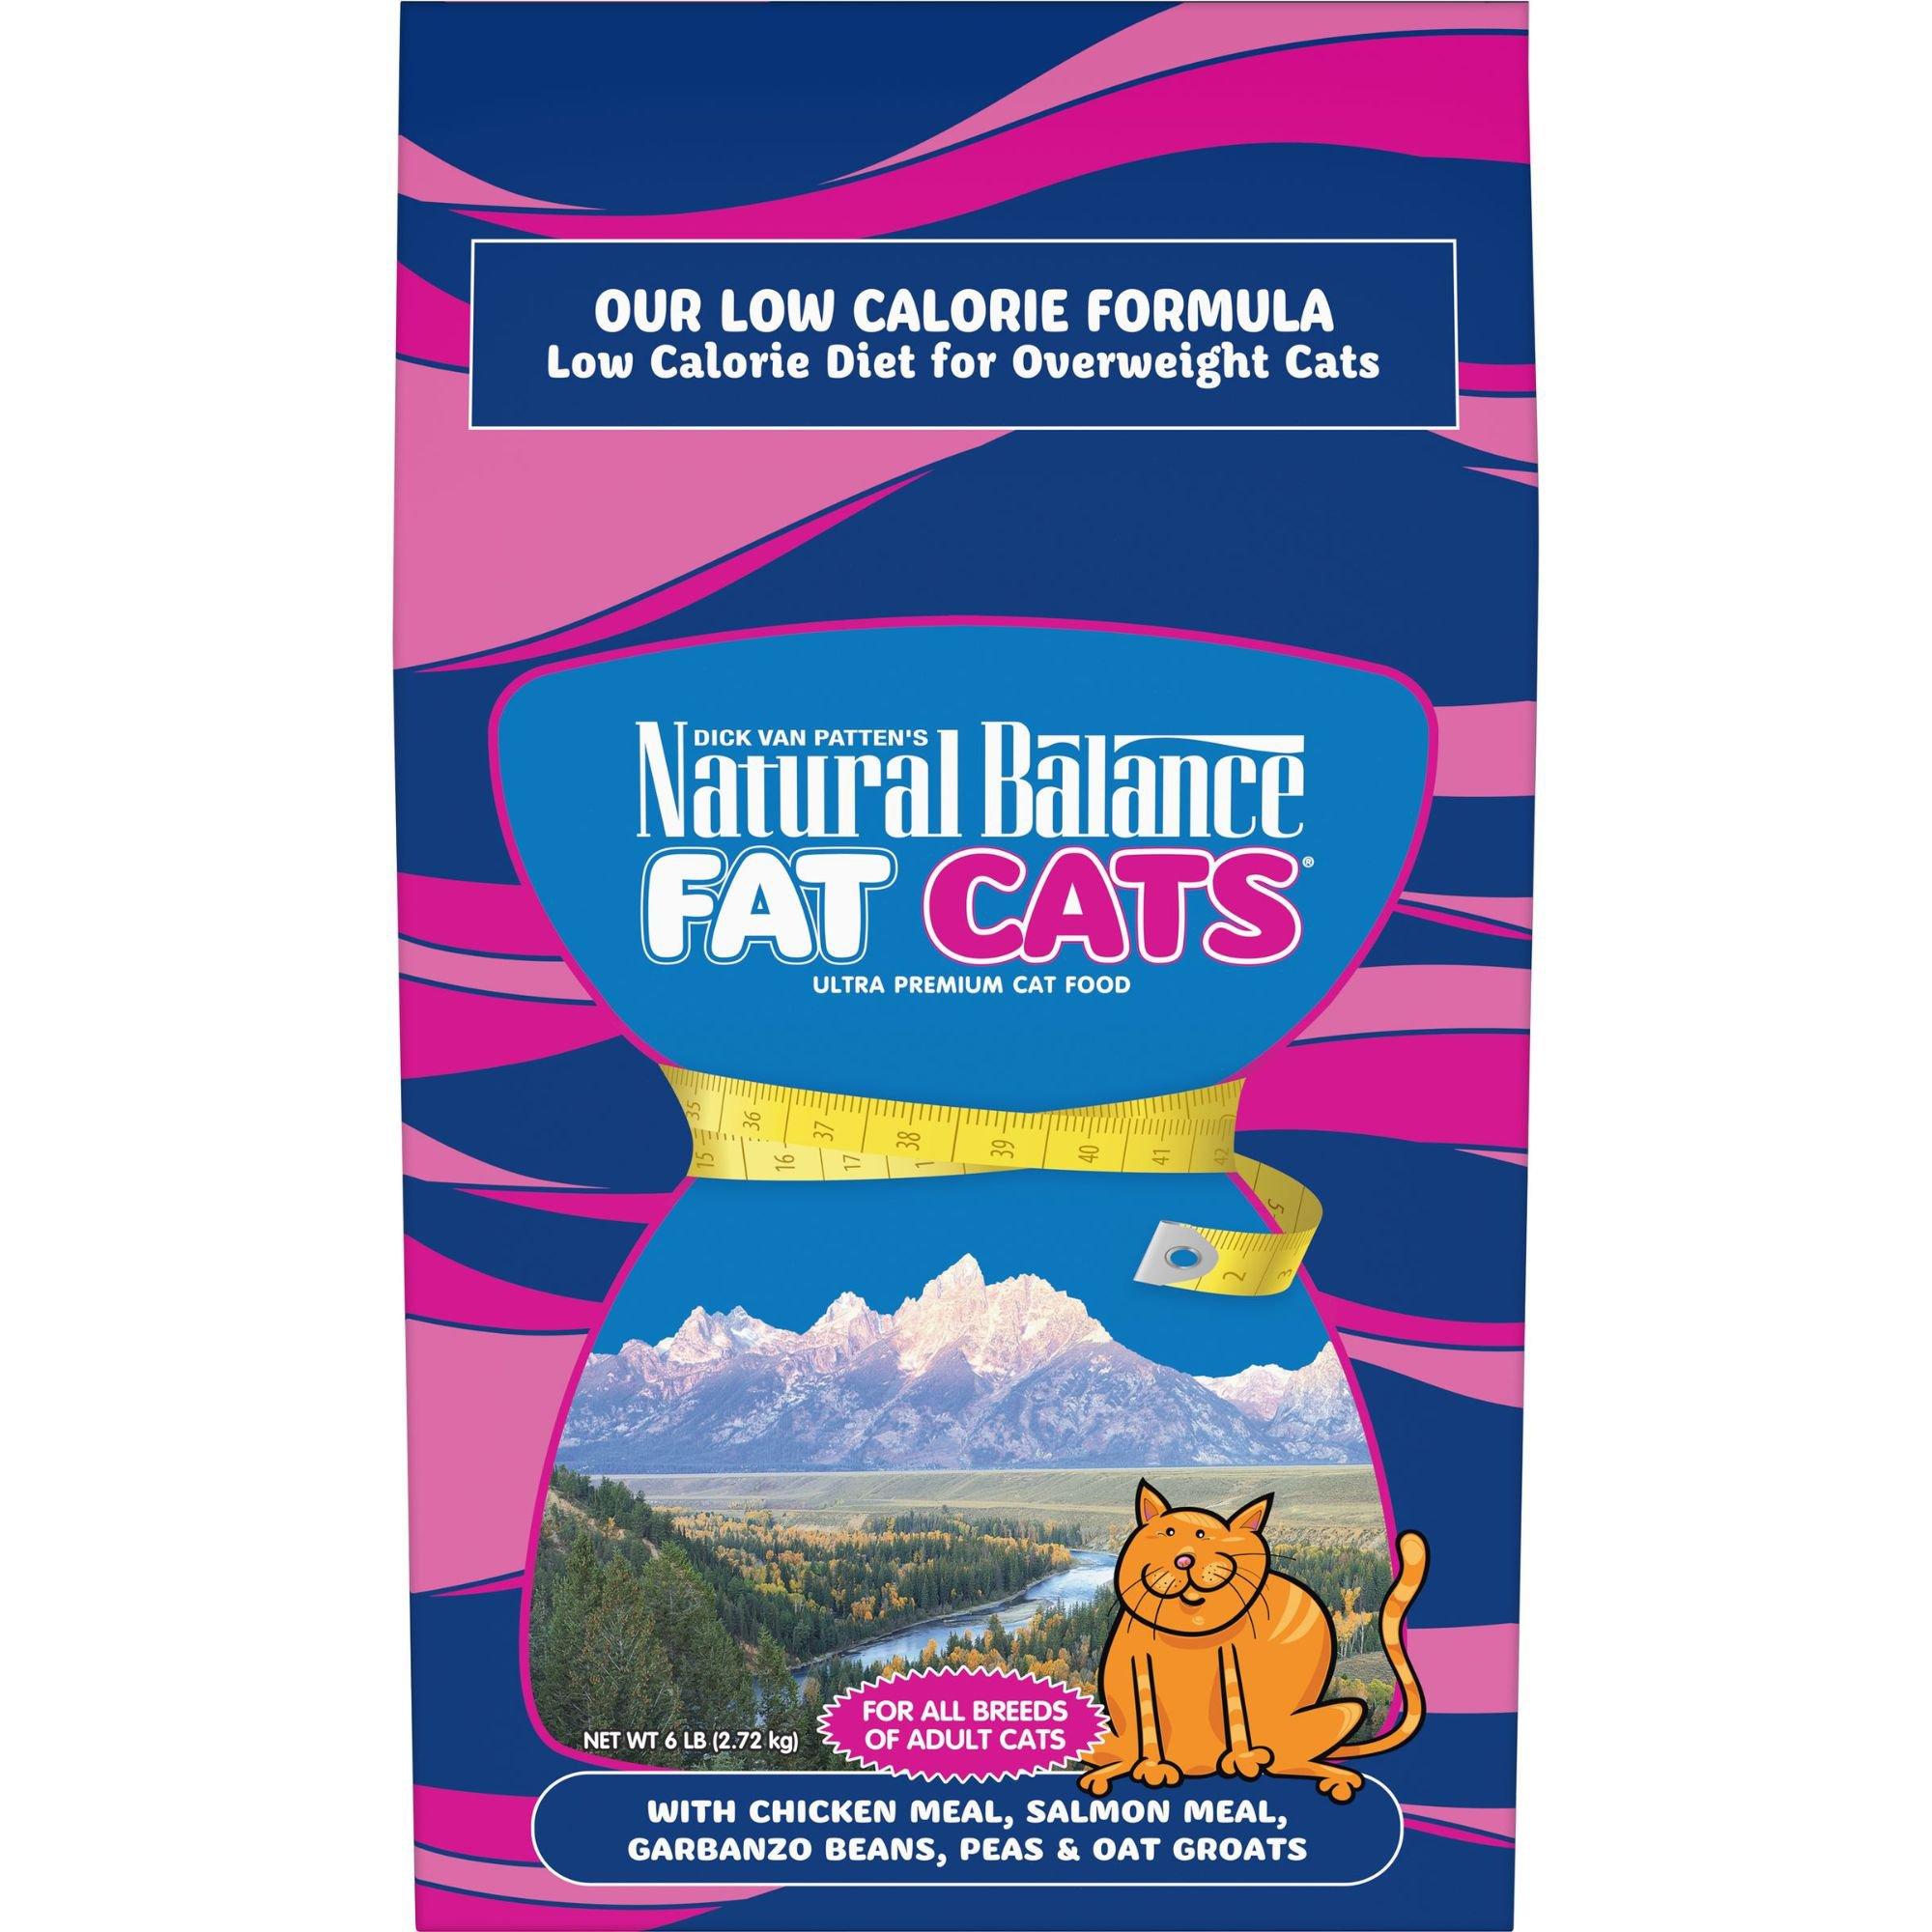 Natural Balance Fat Cat Dry Food